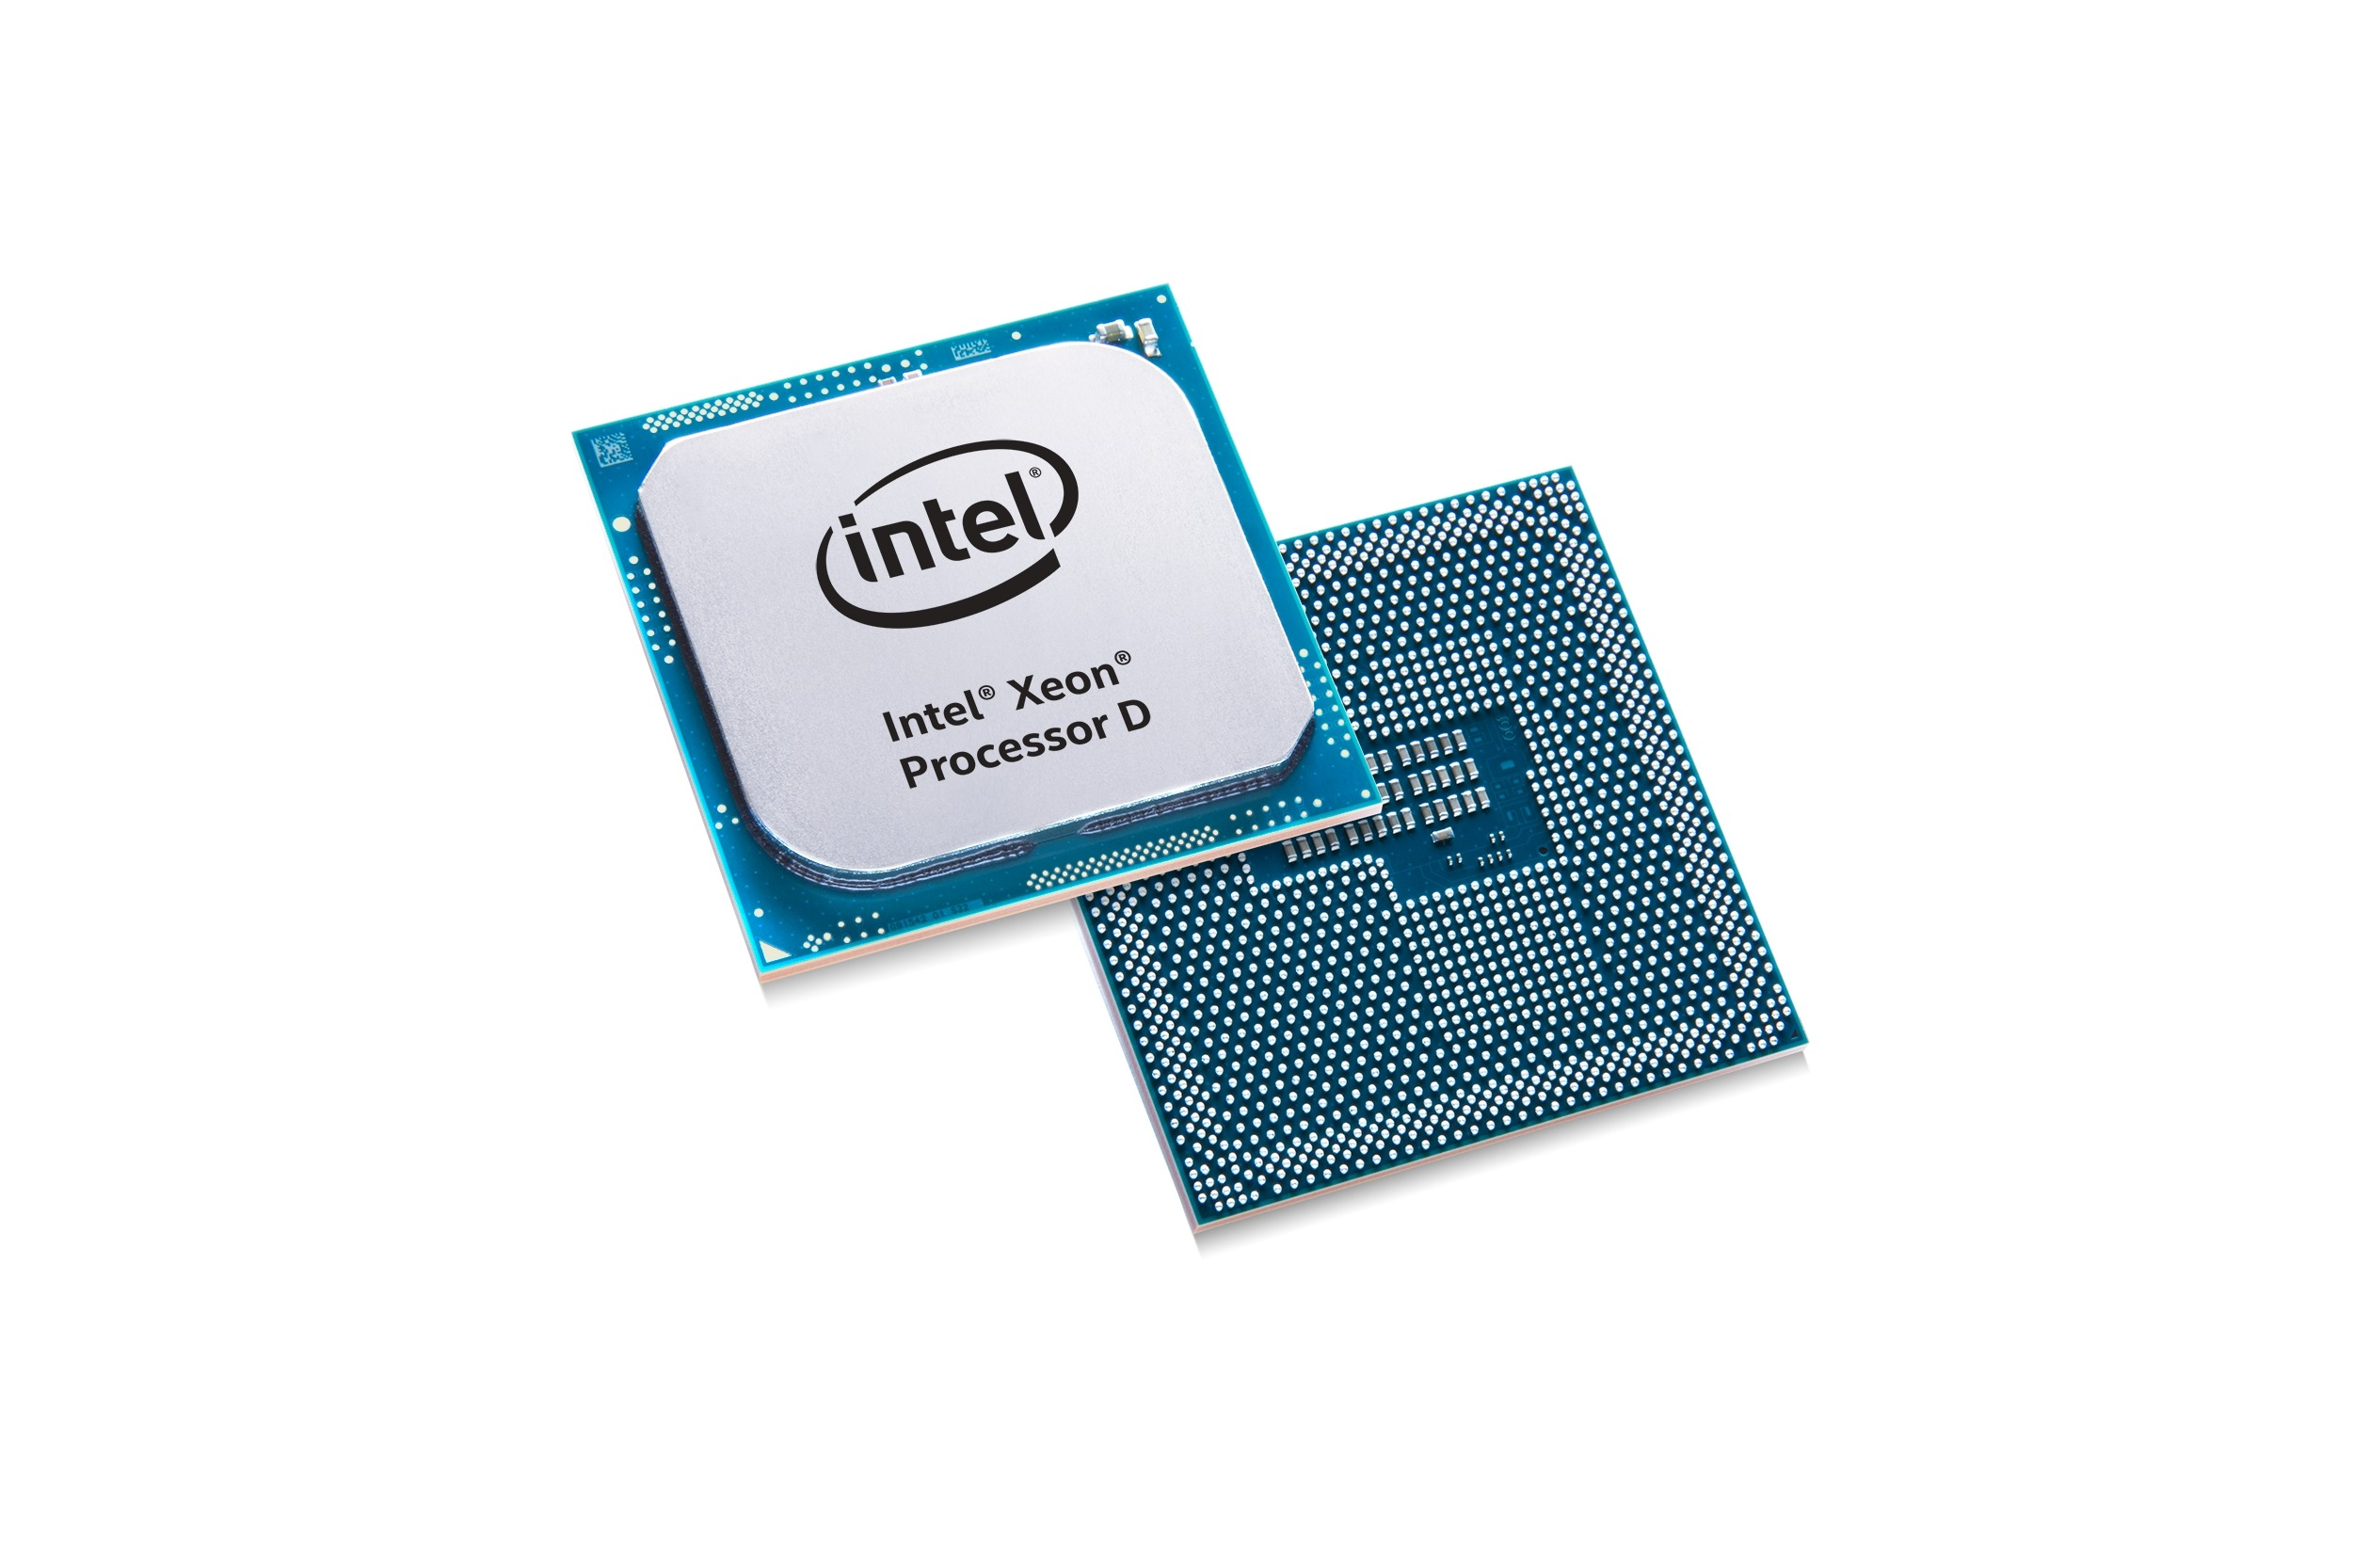 intel-xeon-processor-d-1500